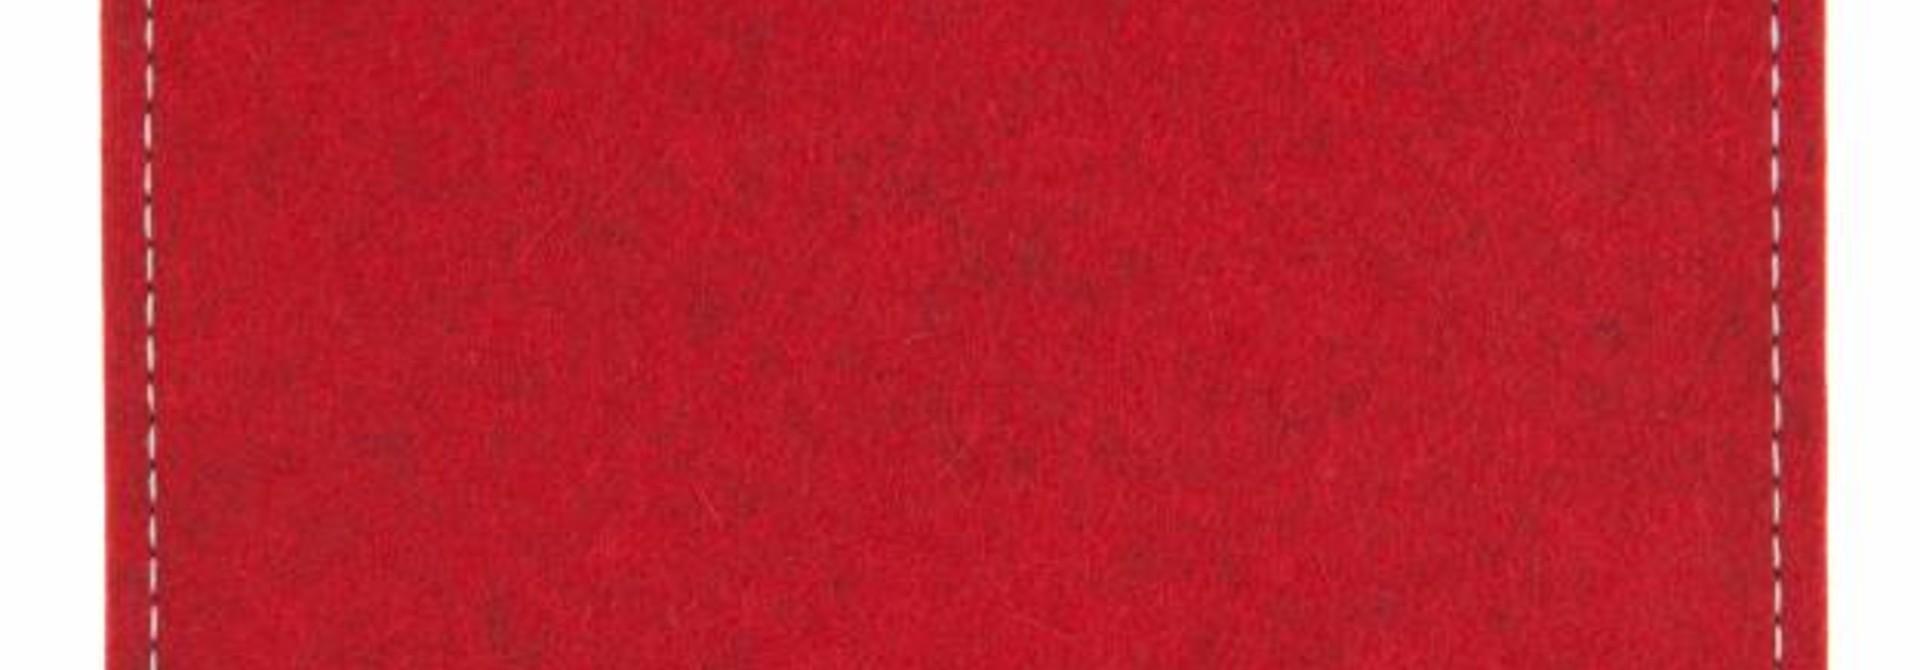 Surface Sleeve Cherry